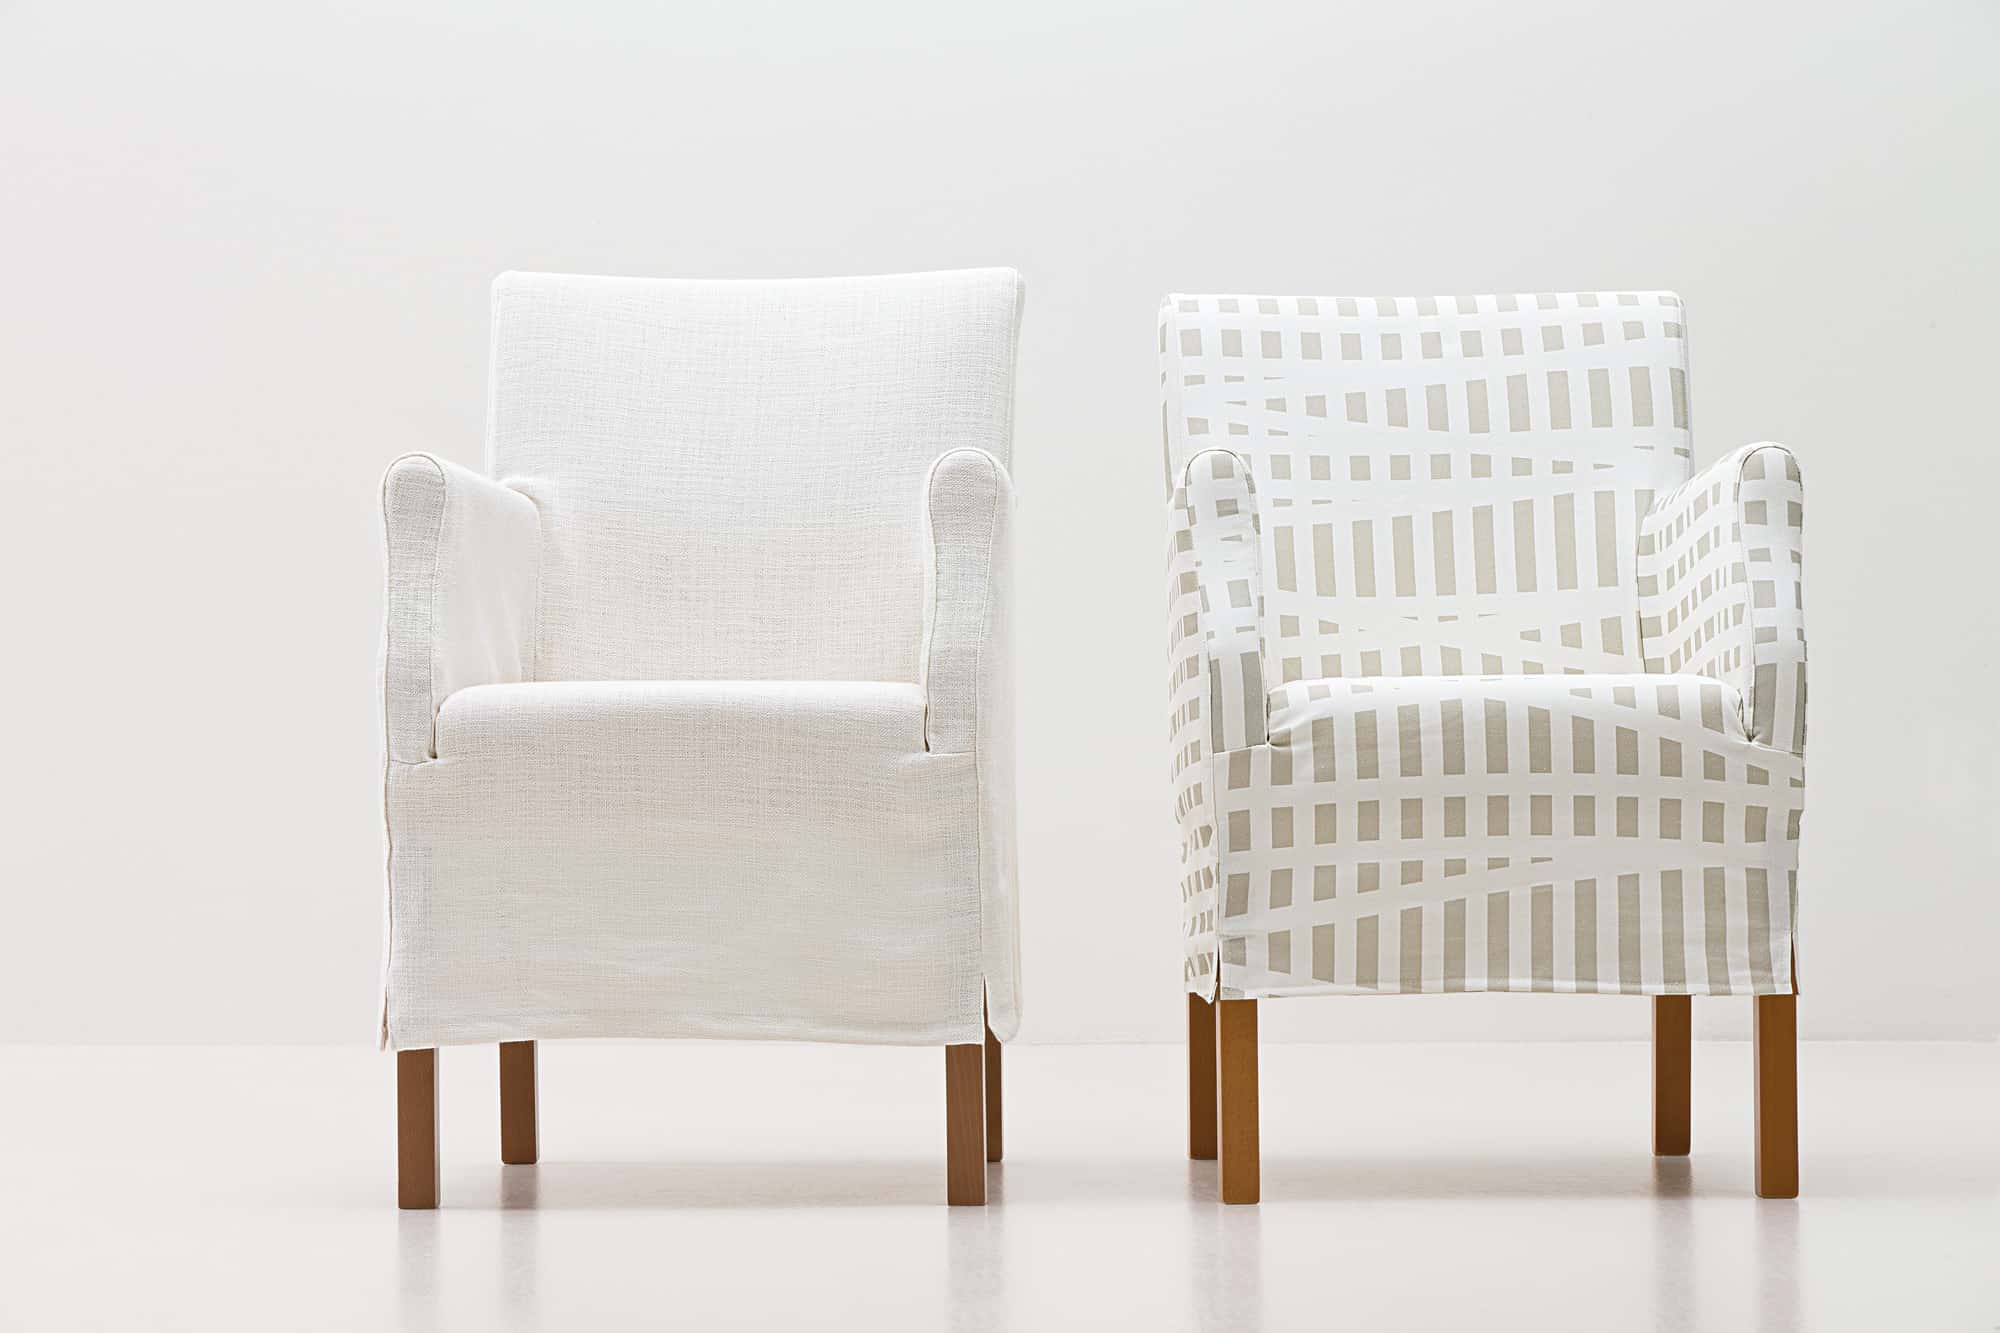 Tisch Fur Sessel